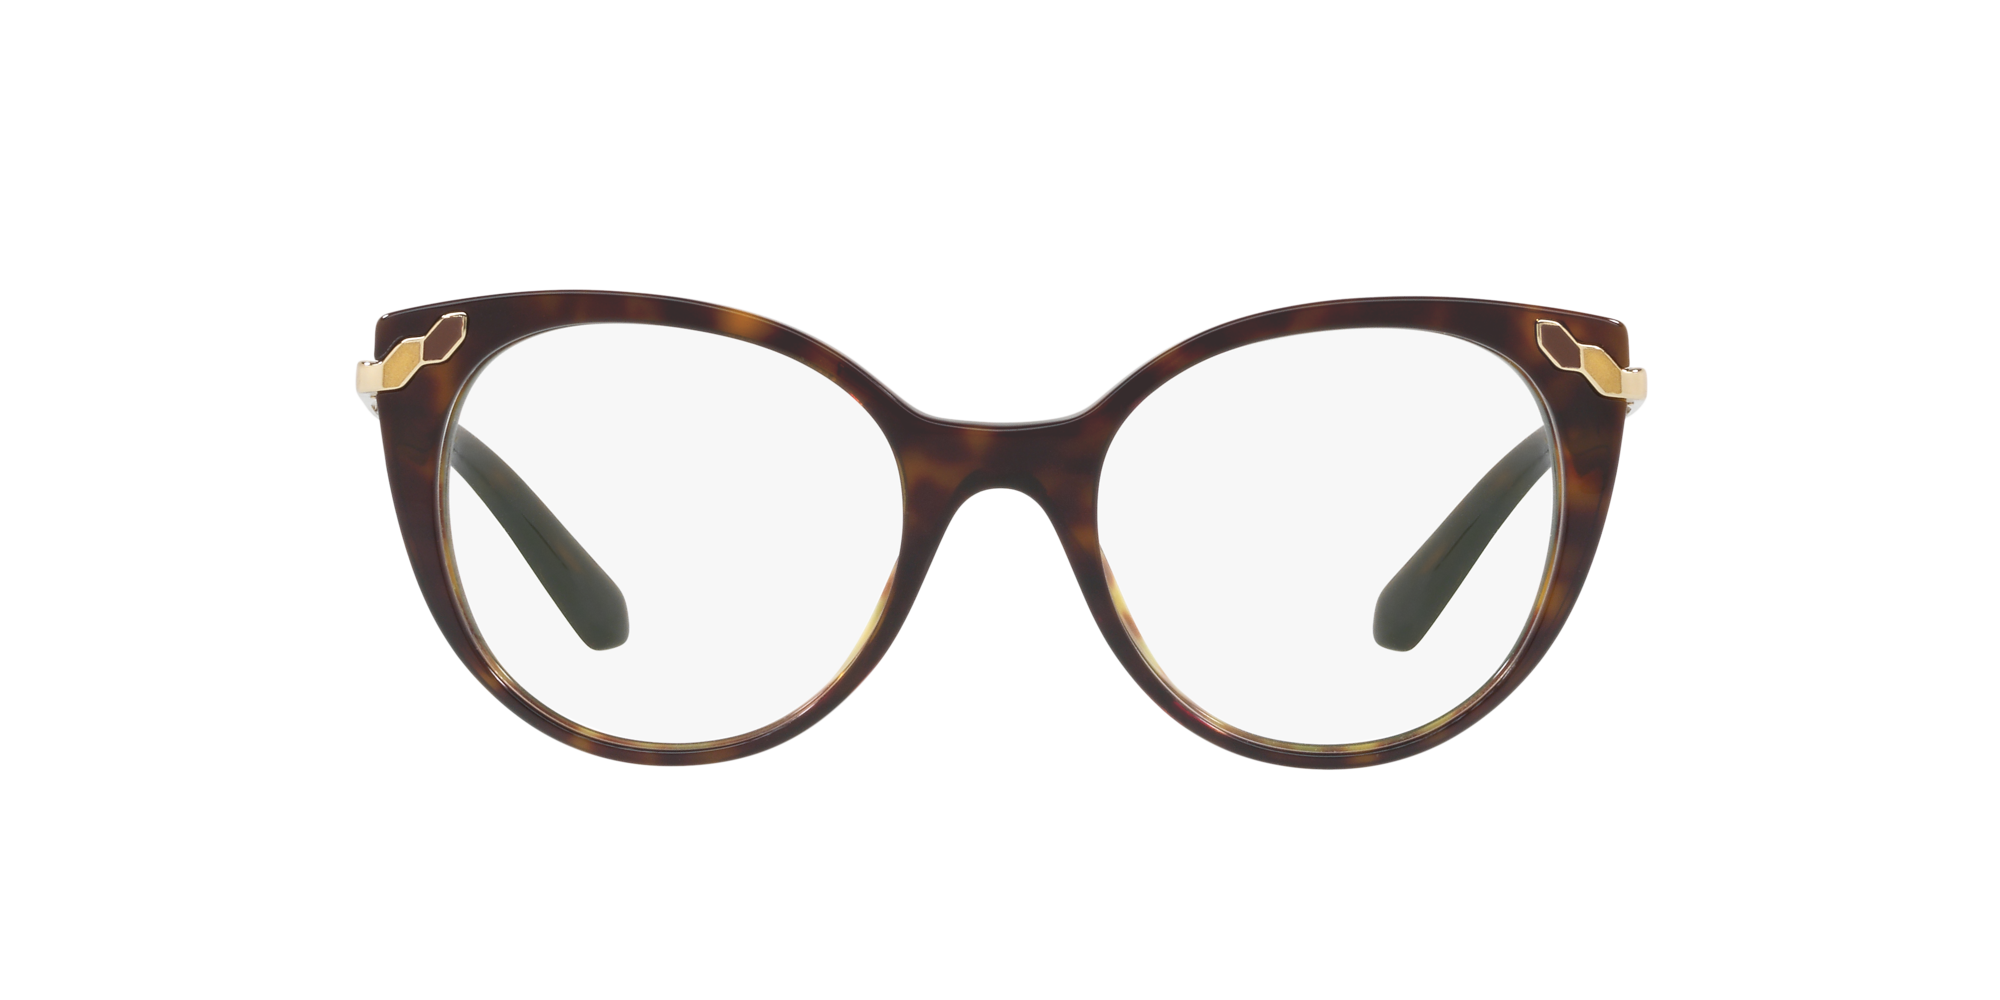 Image for BV4150 from LensCrafters | Glasses, Prescription Glasses Online, Eyewear